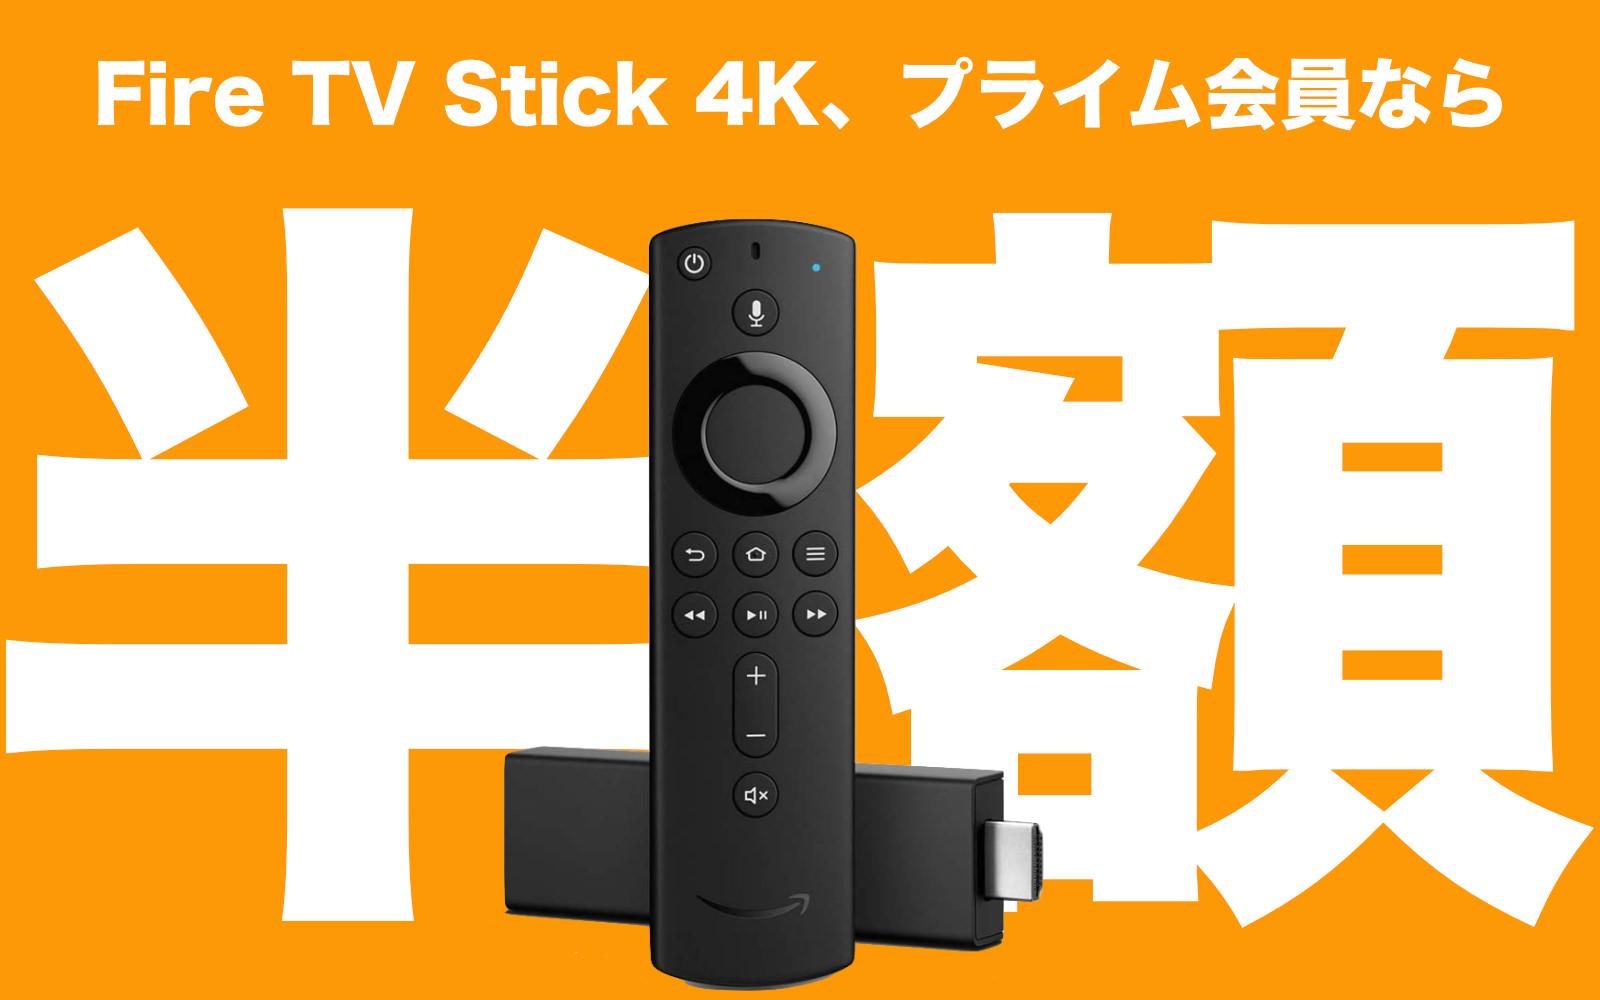 Fire TV Stick 4K 50percent off